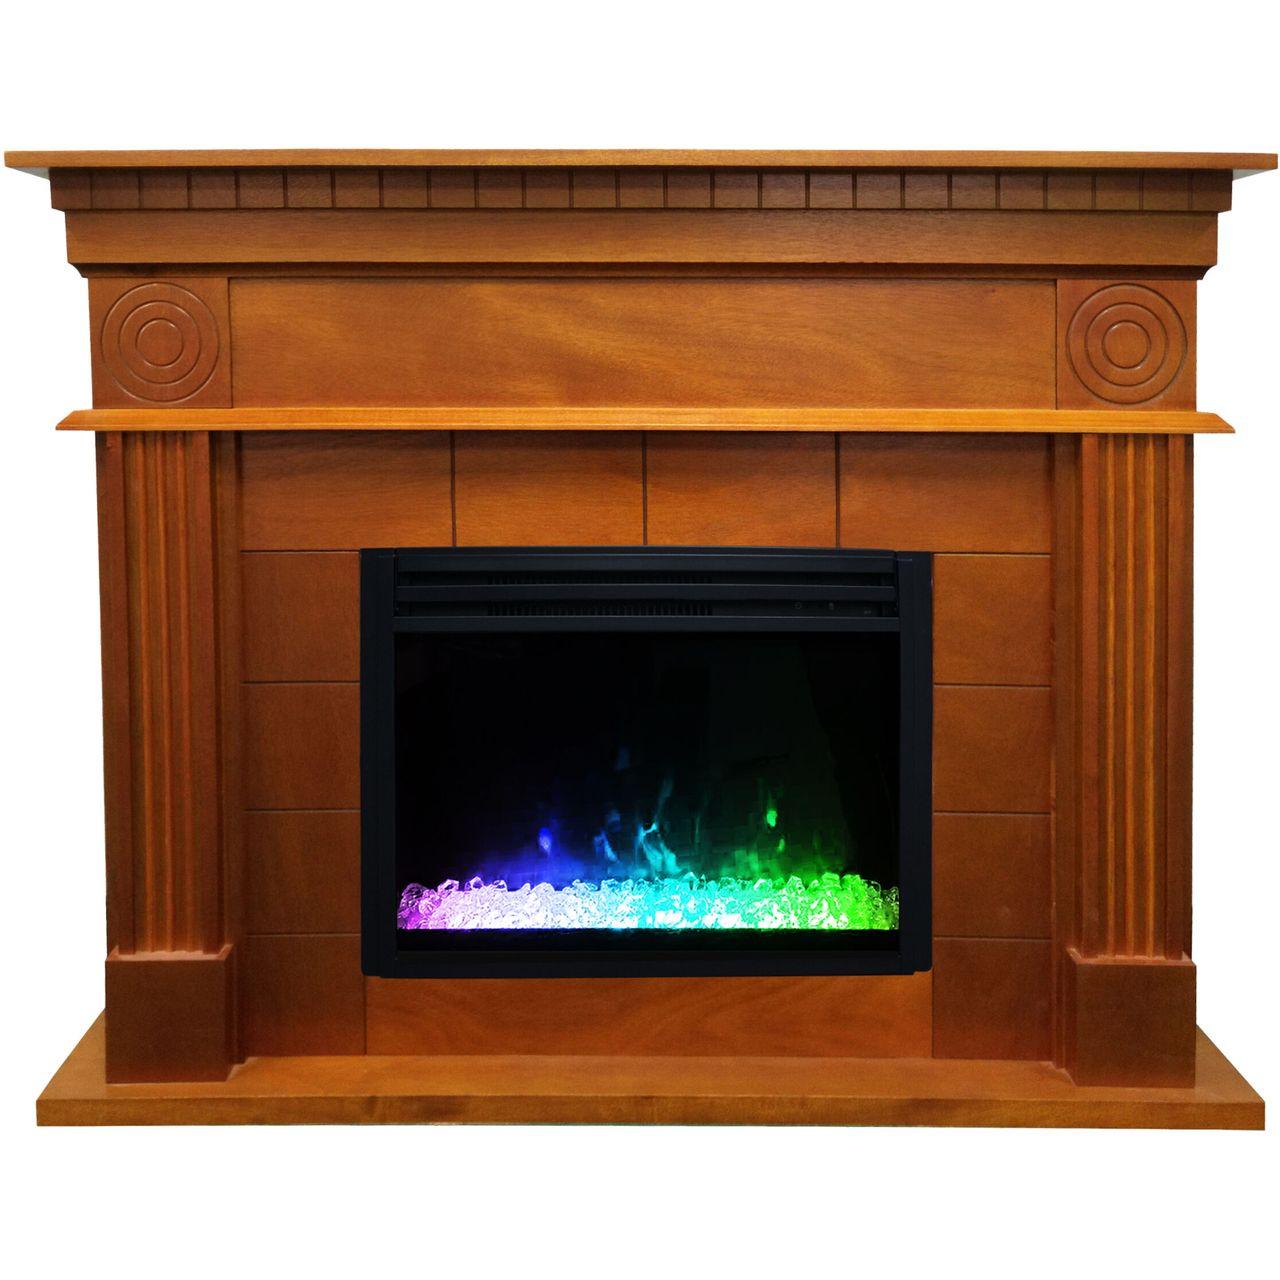 "Cambridge 47.8"" Shelby Electric Fireplace Mantel - Teak"